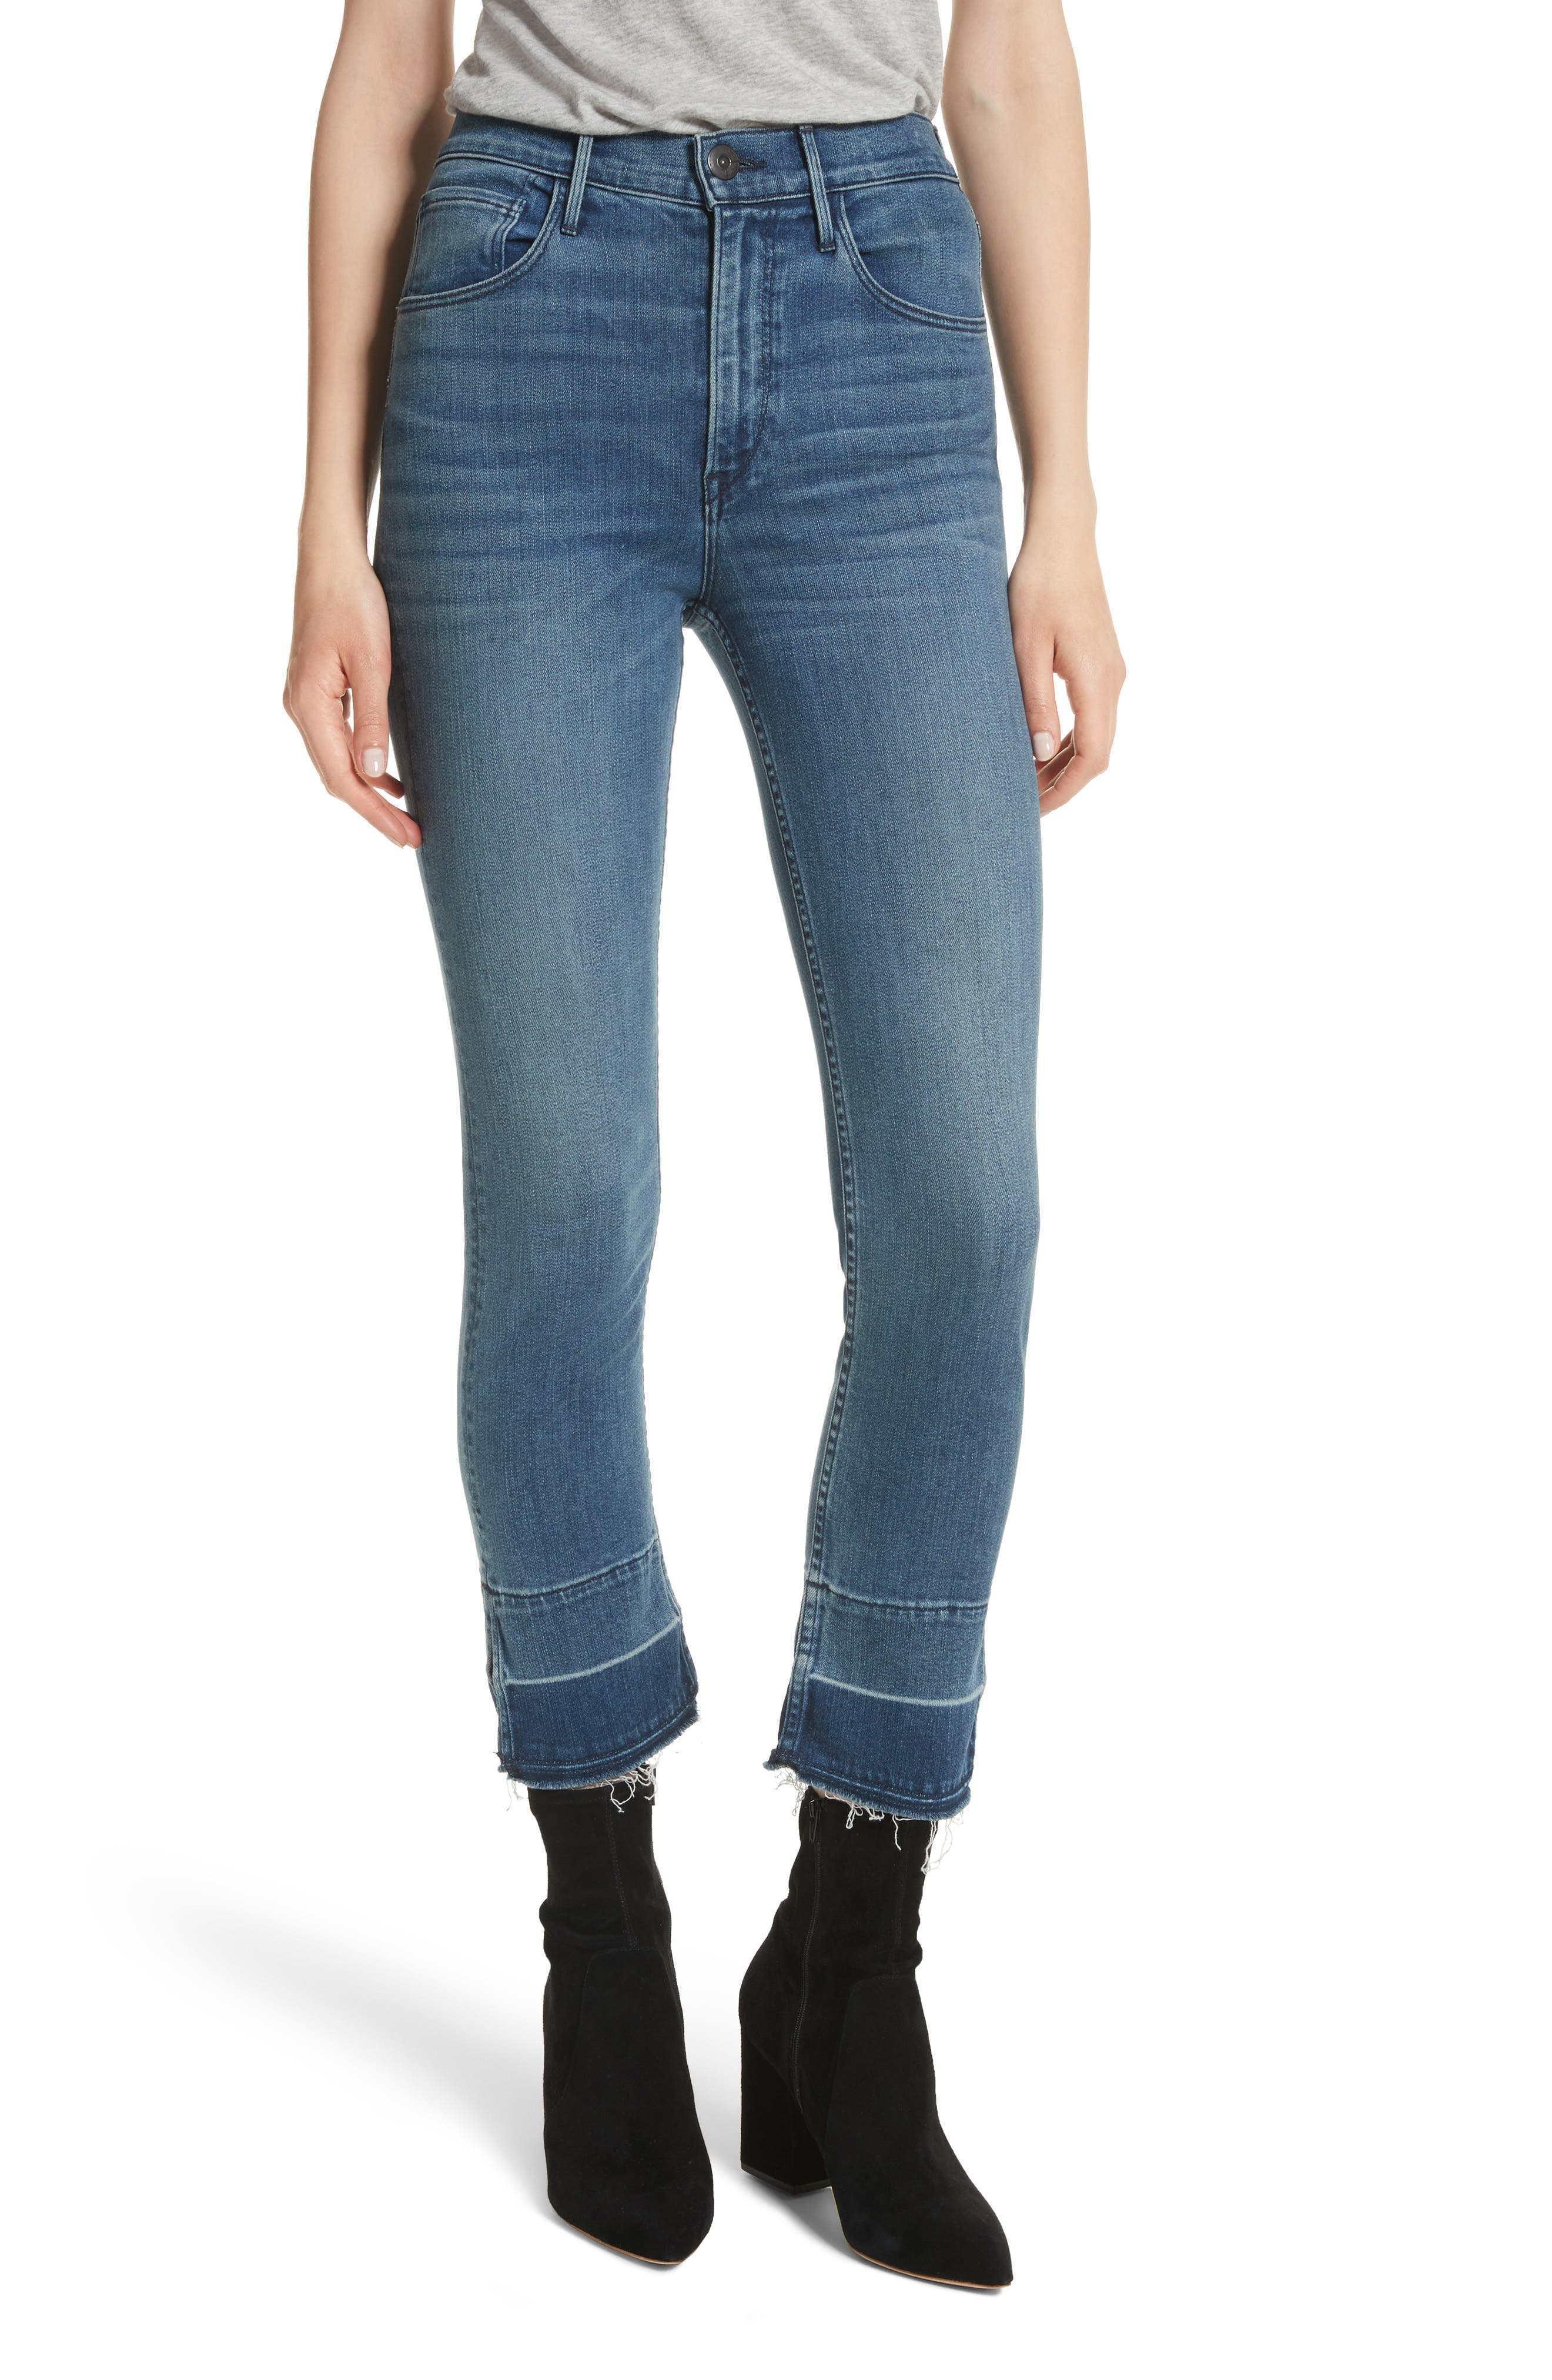 W4 Abigail Released Split Hem Ankle Skinny Jeans,                             Main thumbnail 1, color,                             Ady